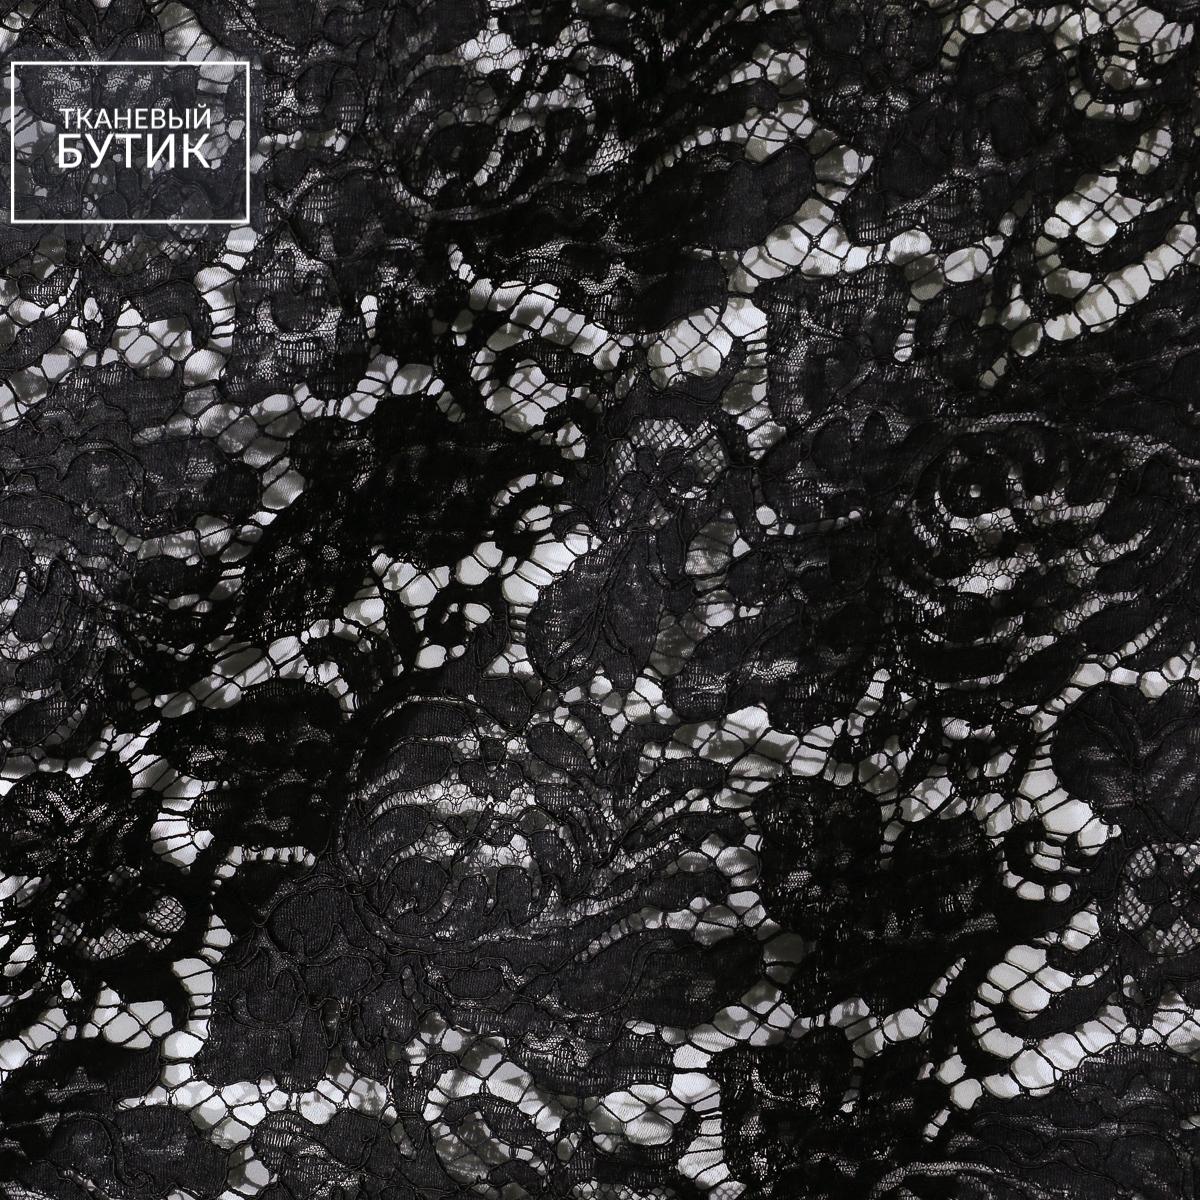 Французское кордовое кружево чёрного цвета